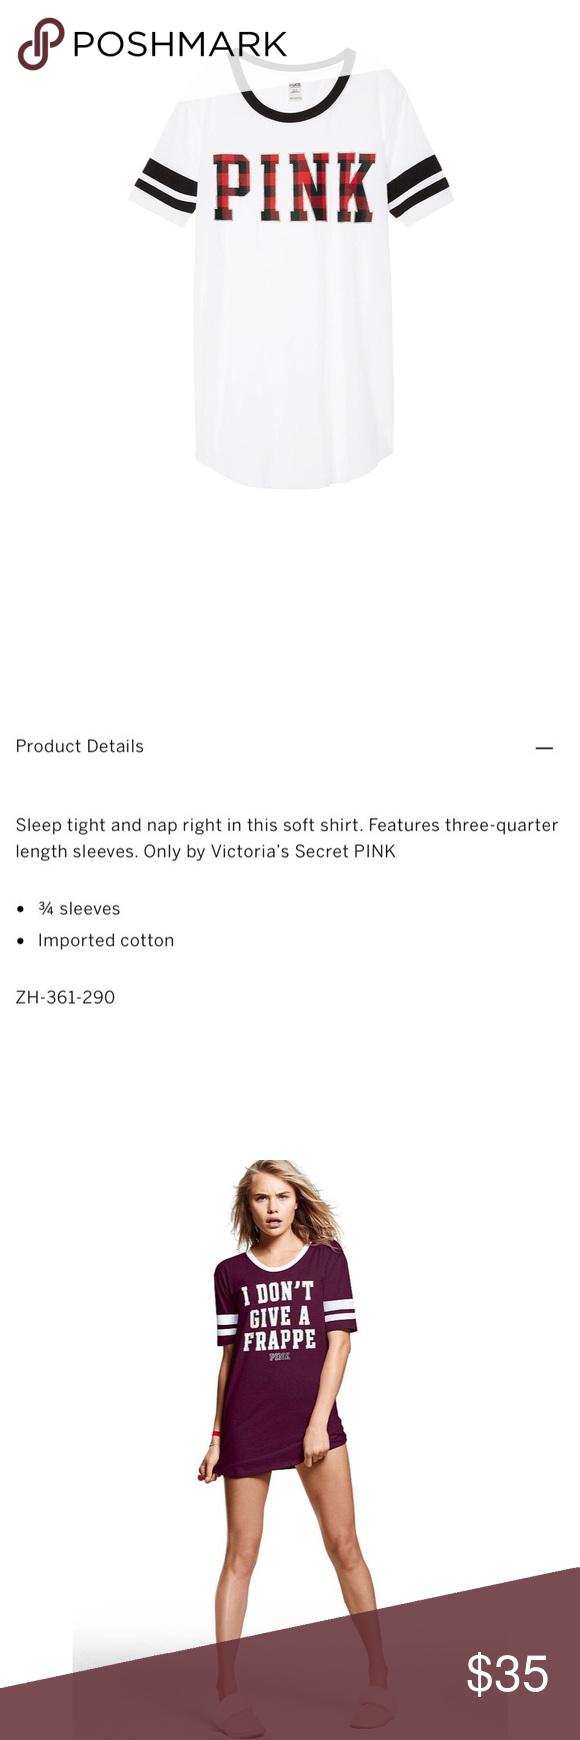 [pink vs] sleep shirt NWT Clothes design, Colorful